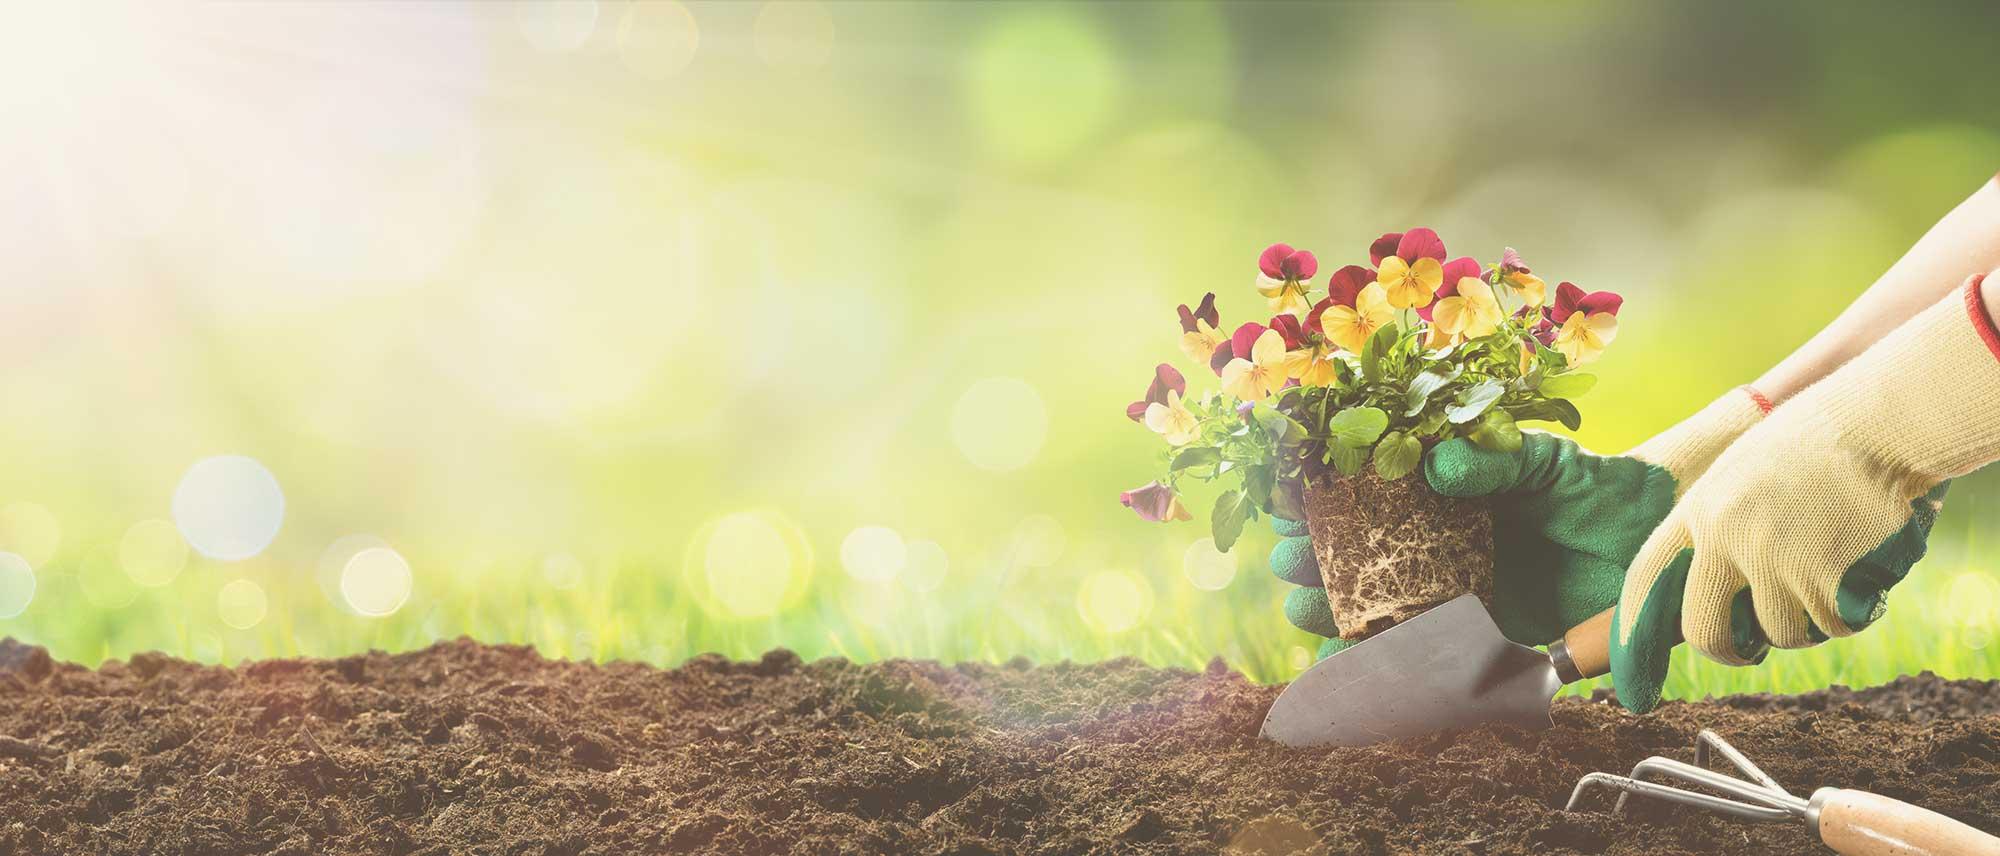 Gardening-644727100